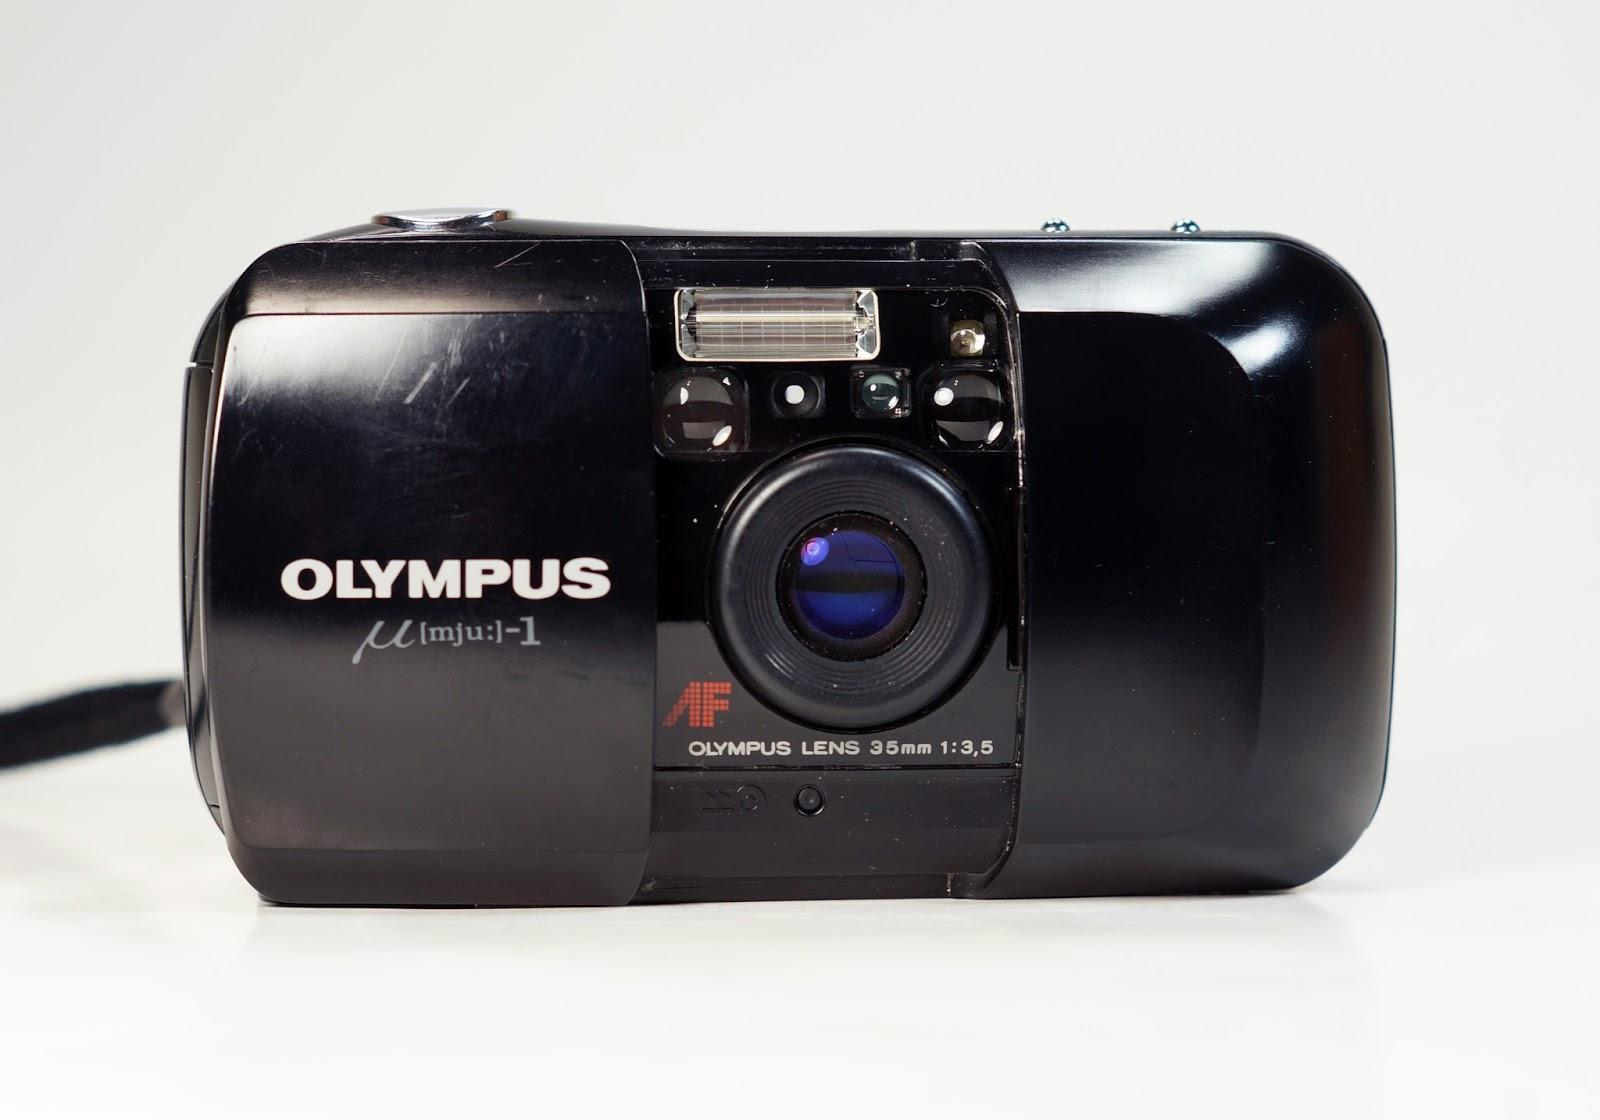 olympus mju i infinity stylus mju 1 f 3 5 35mm point shoot rh graphictrip blogspot com olympus stylus tough camera manual olympus stylus tough camera manual